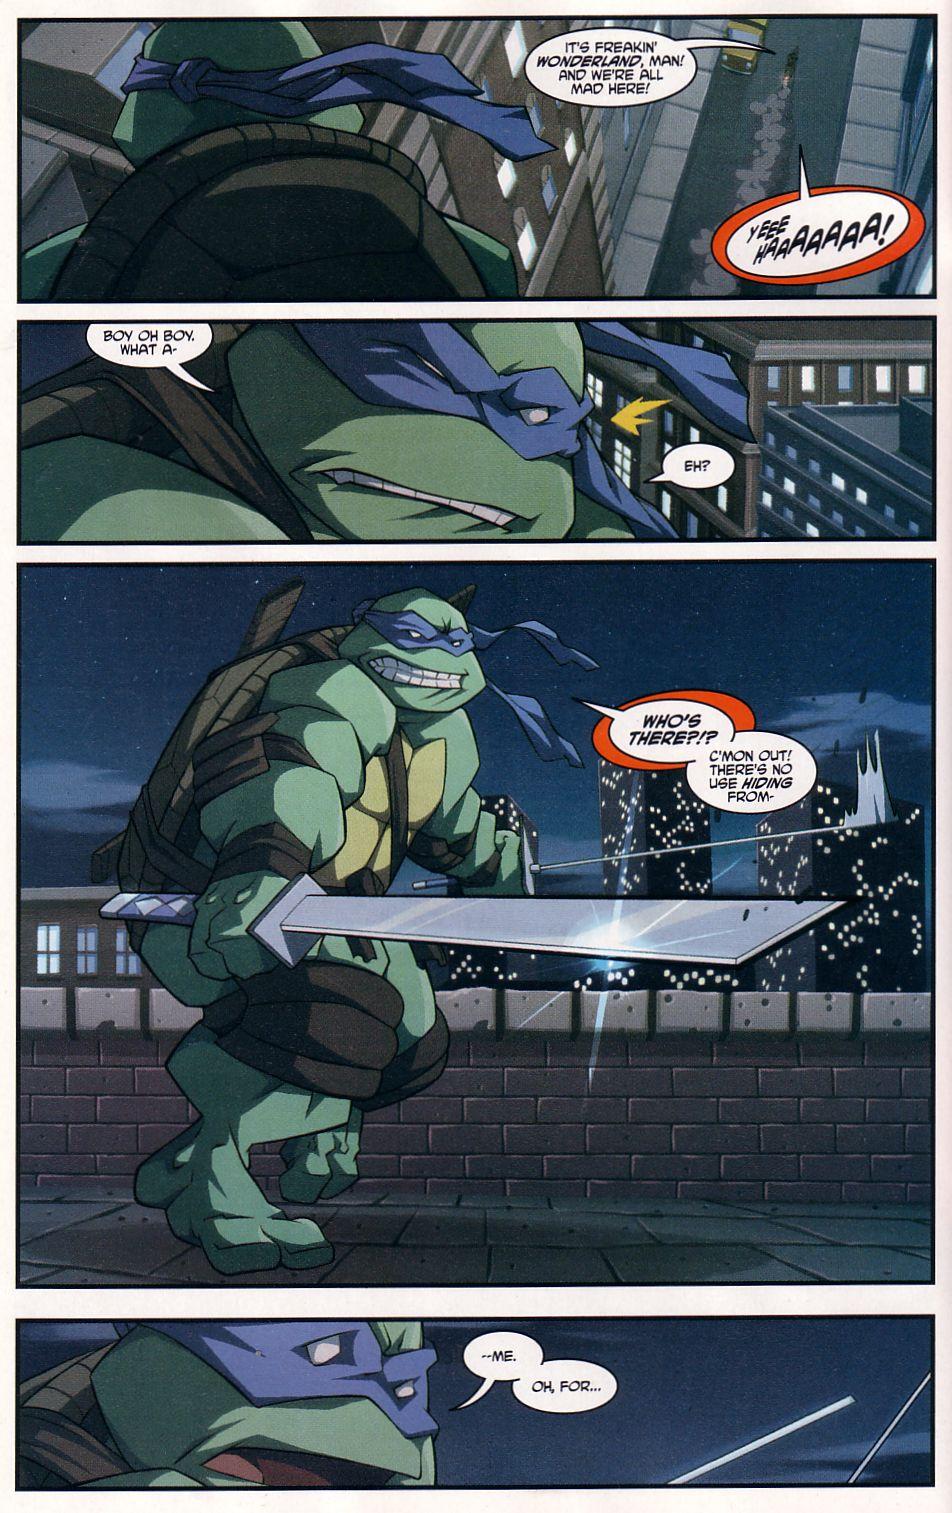 Teenage Mutant Ninja Turtles (2003) chap 7 pic 8